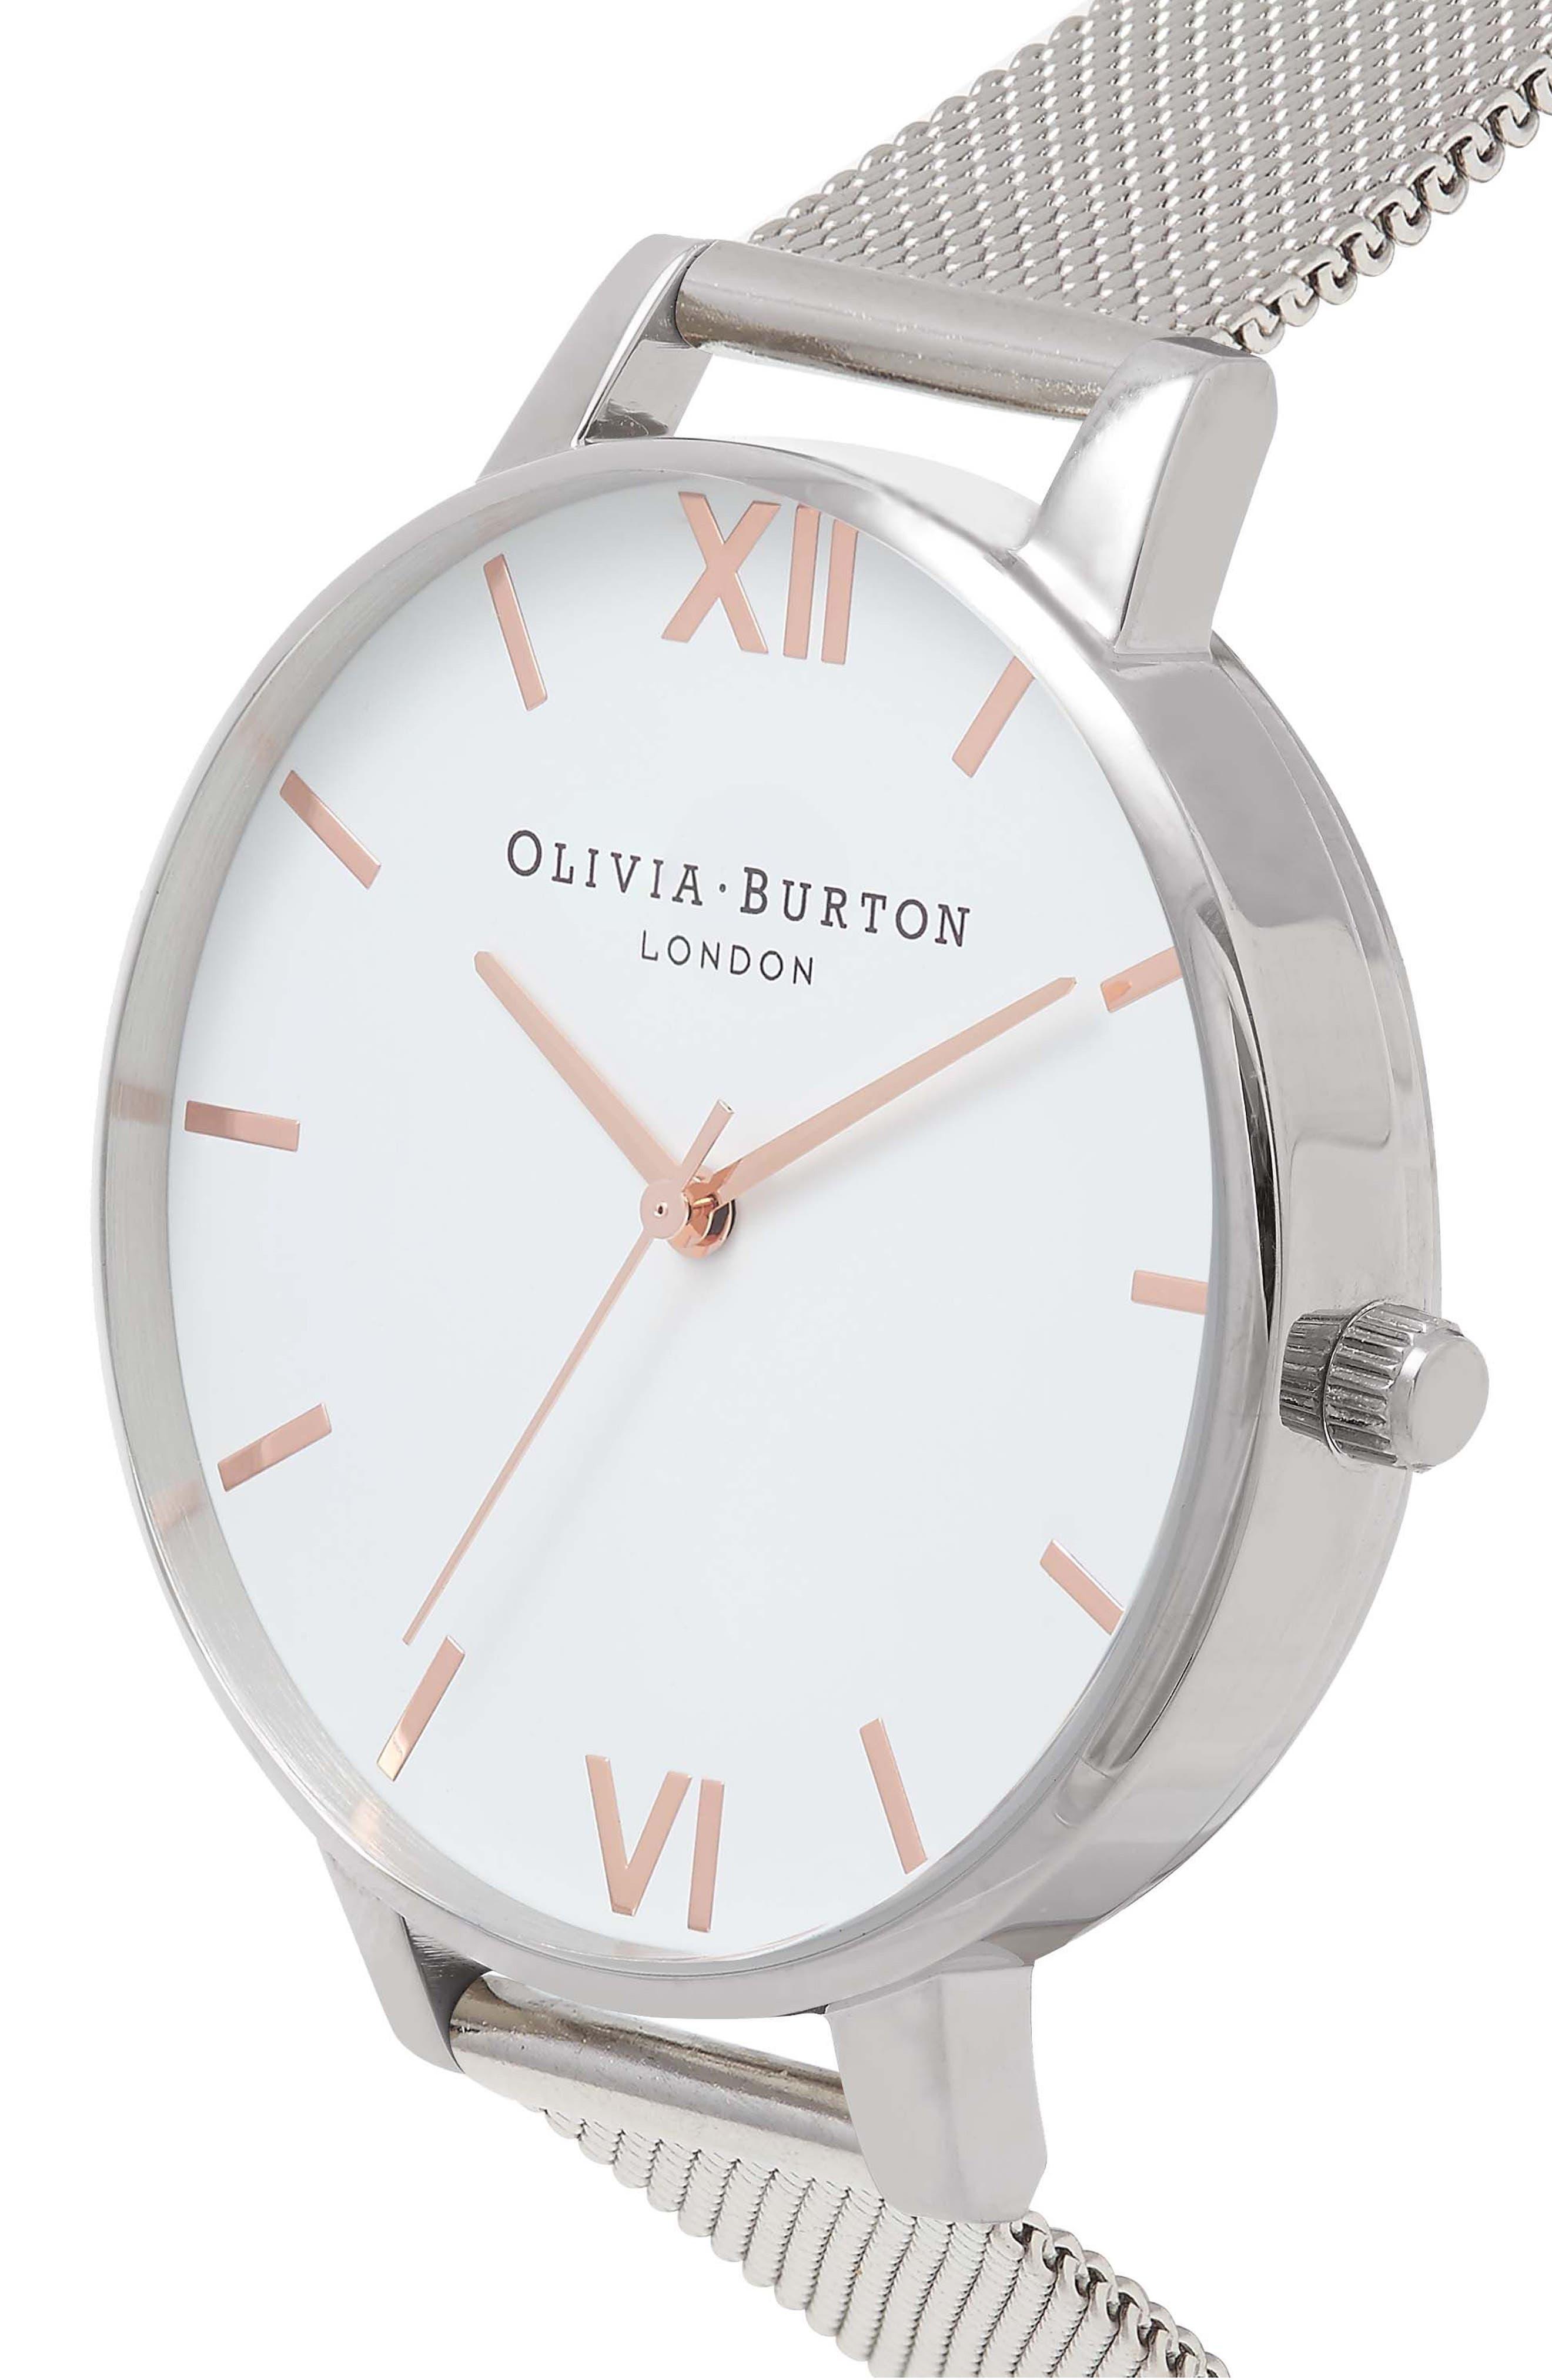 OLIVIA BURTON, Mesh Strap Watch, 38mm, Alternate thumbnail 4, color, SILVER/ WHITE/ ROSE GOLD